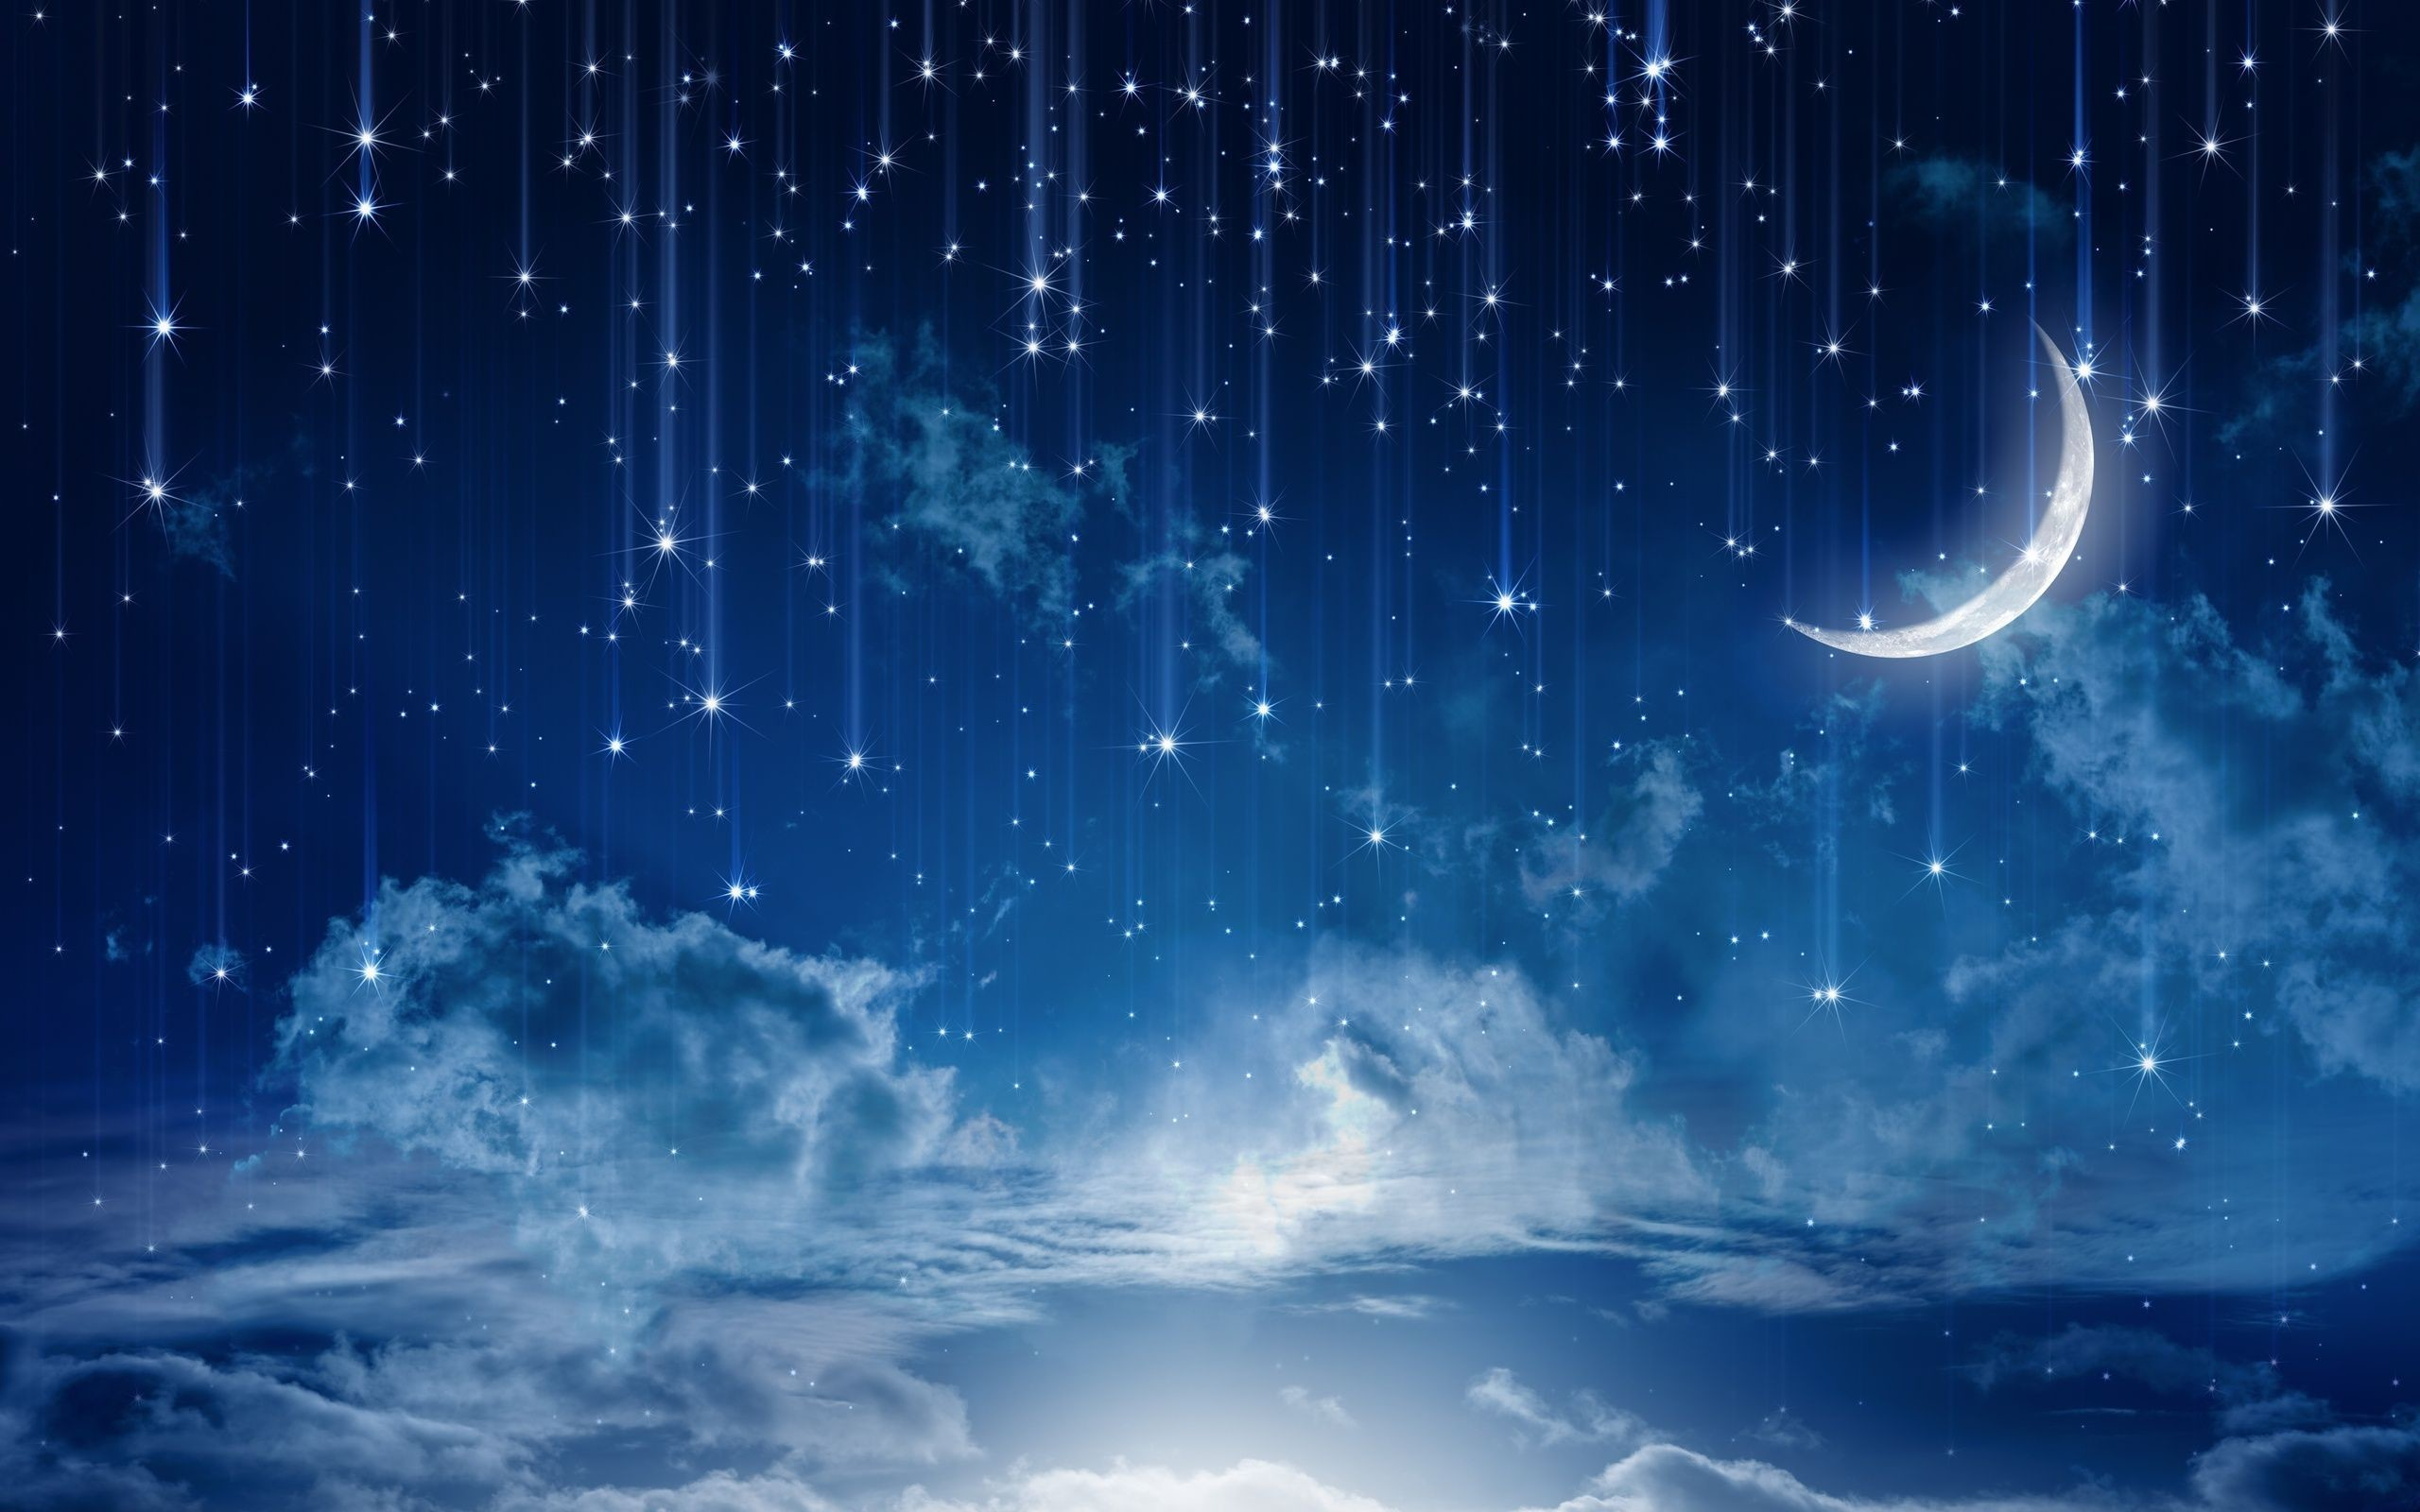 Pleiades Star Cluster HD desktop wallpaper High Definition